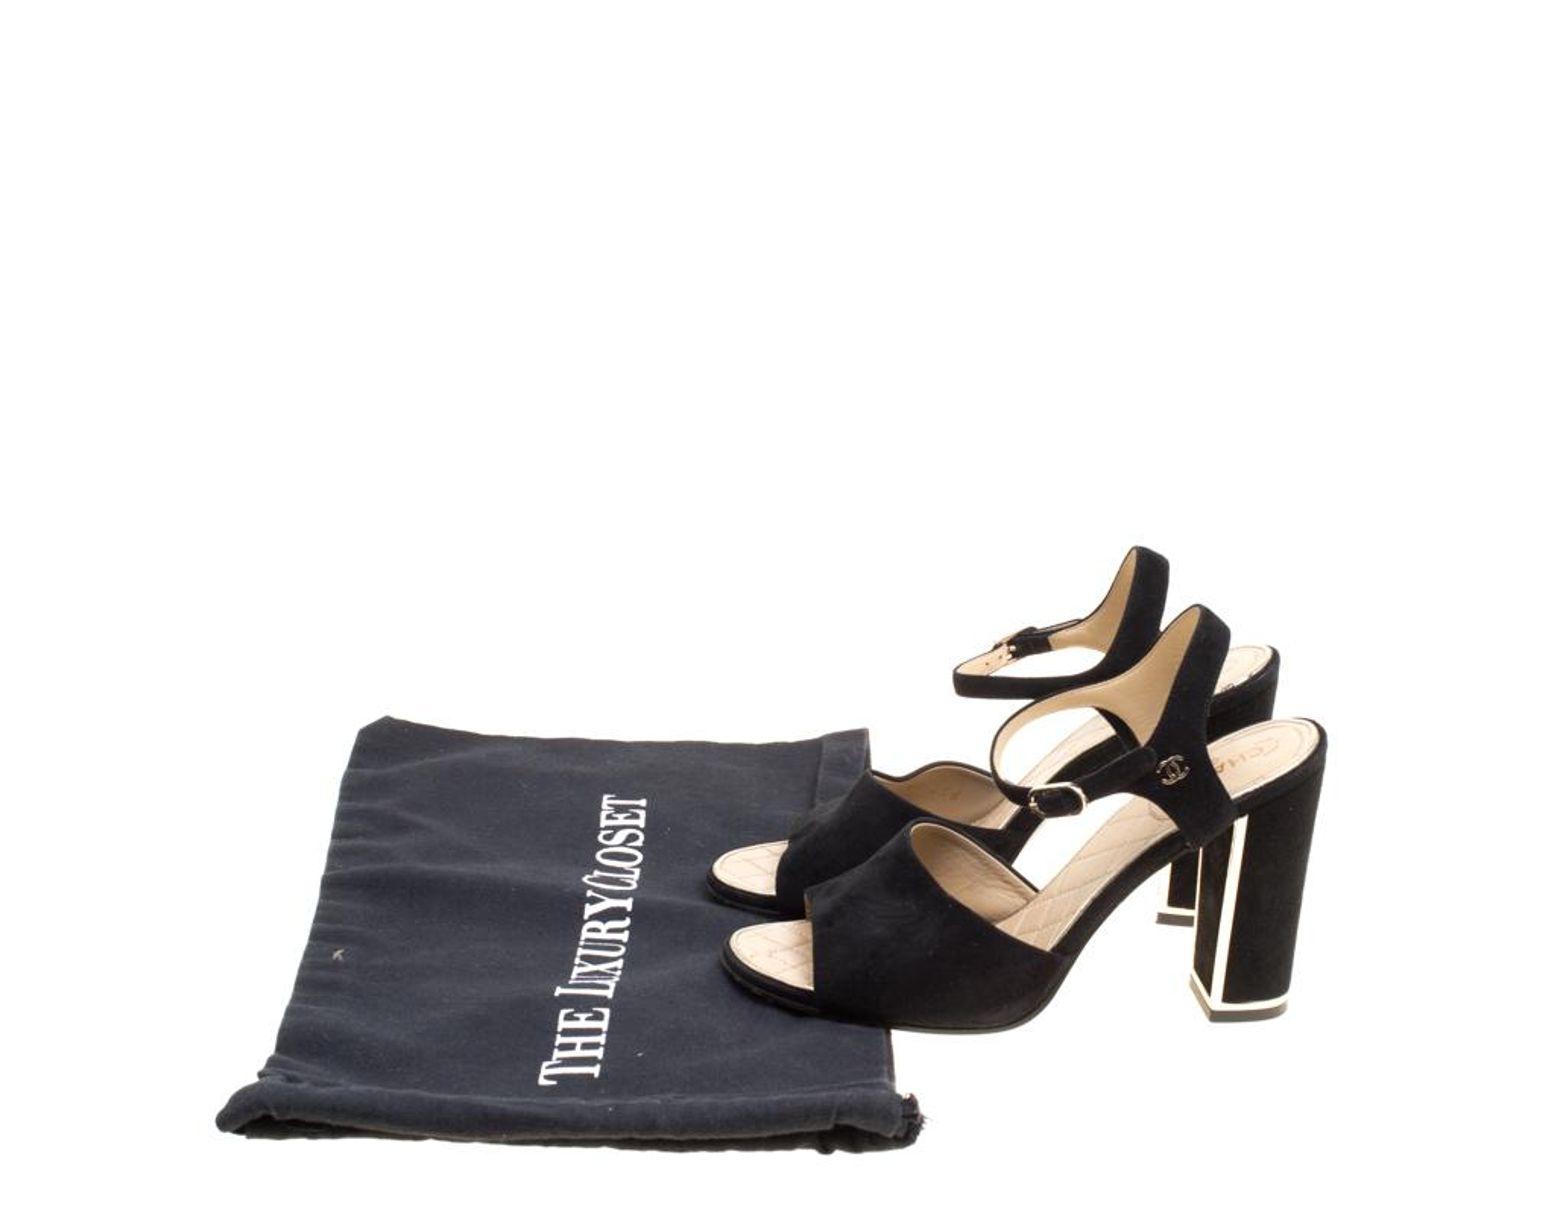 8d8dc0826 Lyst - Chanel Black Suede Ankle Strap Block Heel Sandals Size 37.5 in Black